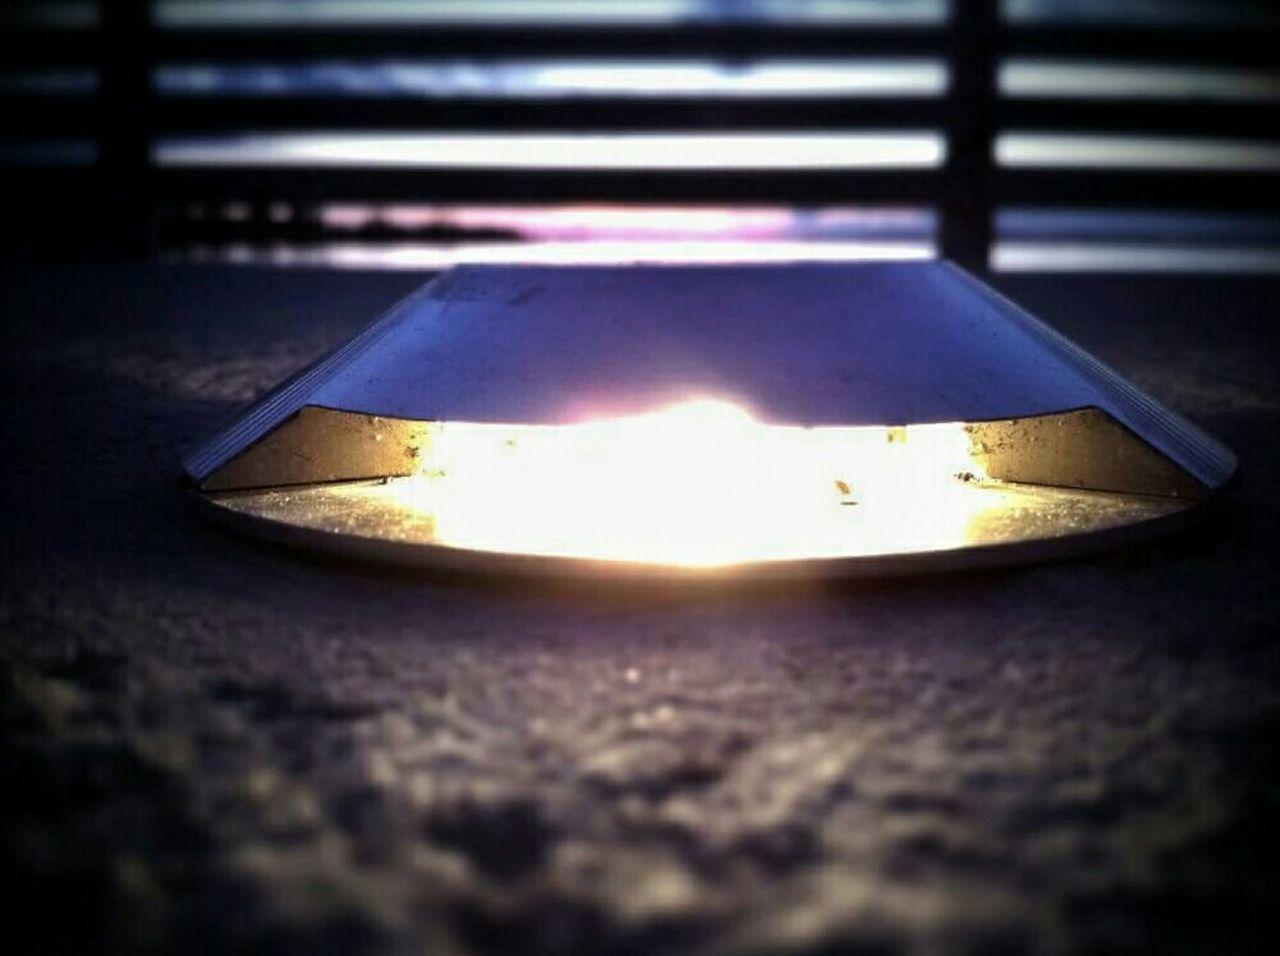 illuminated, burning, flame, heat - temperature, no people, single object, close-up, night, indoors